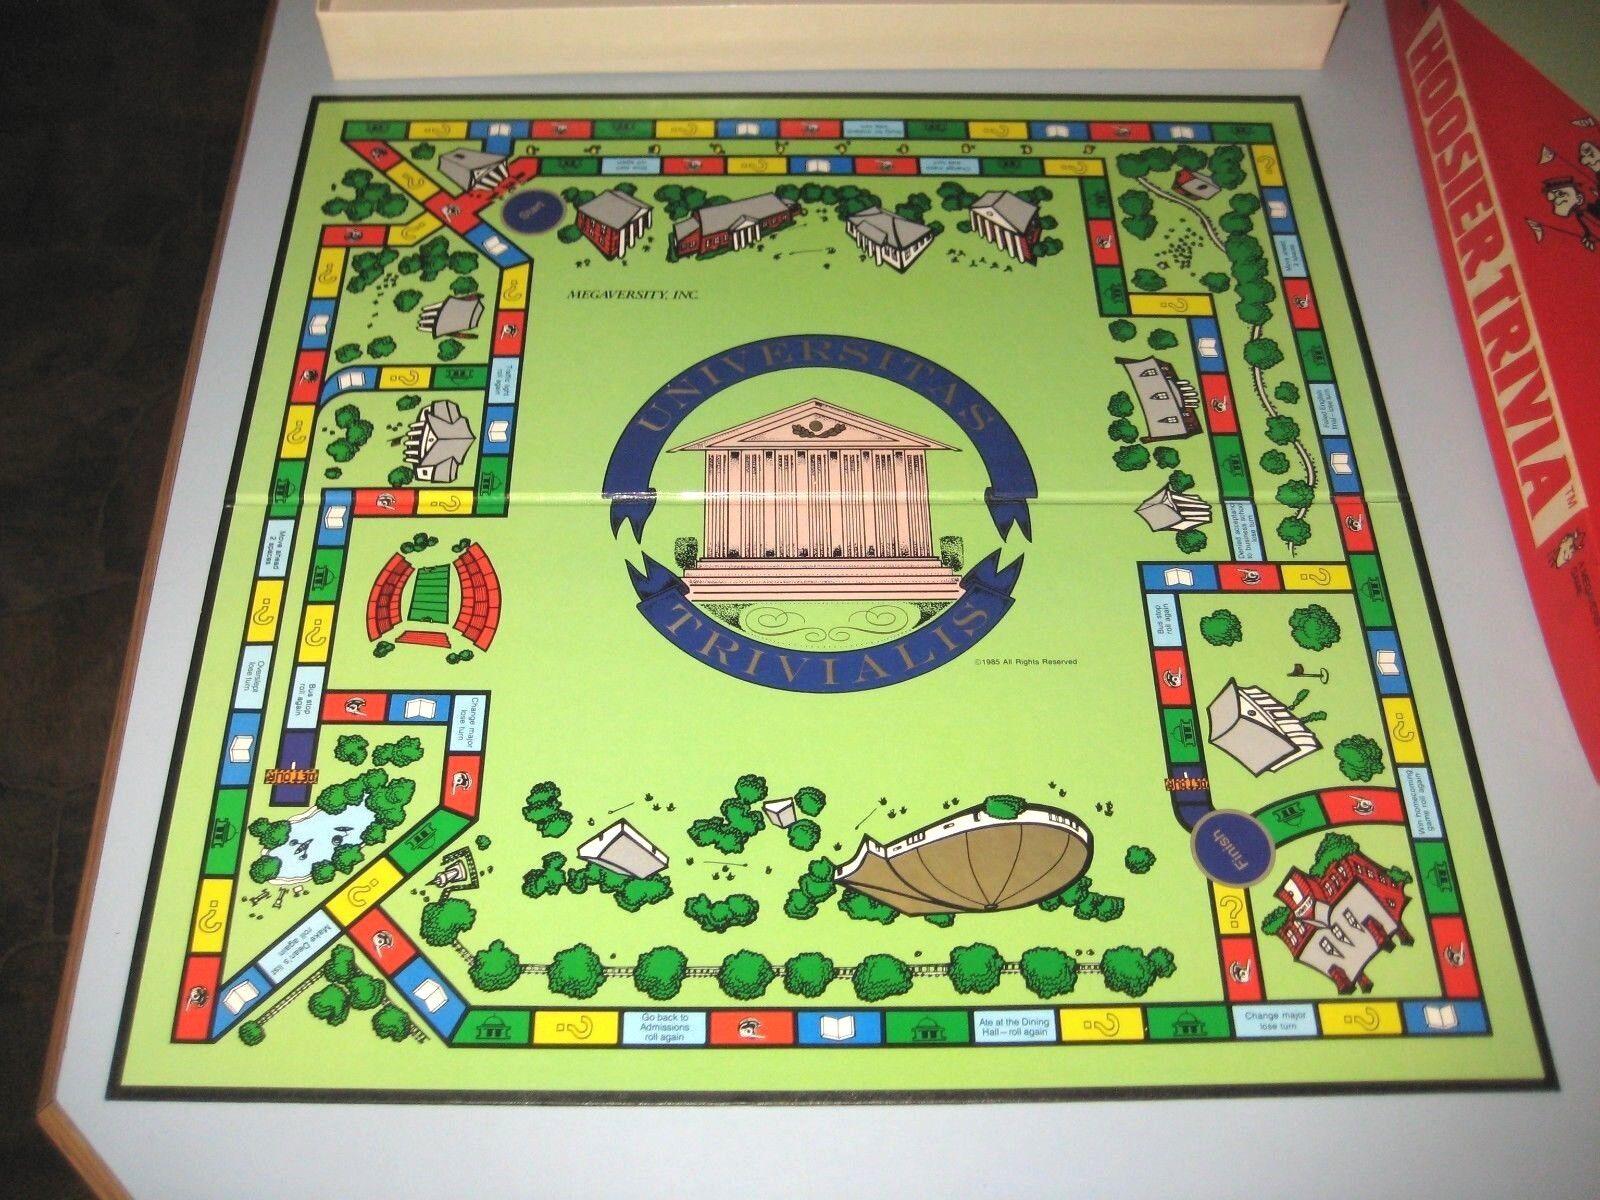 2  Indiana University IU Board Games Hoosier Trivia Trivia Trivia I U Opoly  Megaversity Game b0d8fa